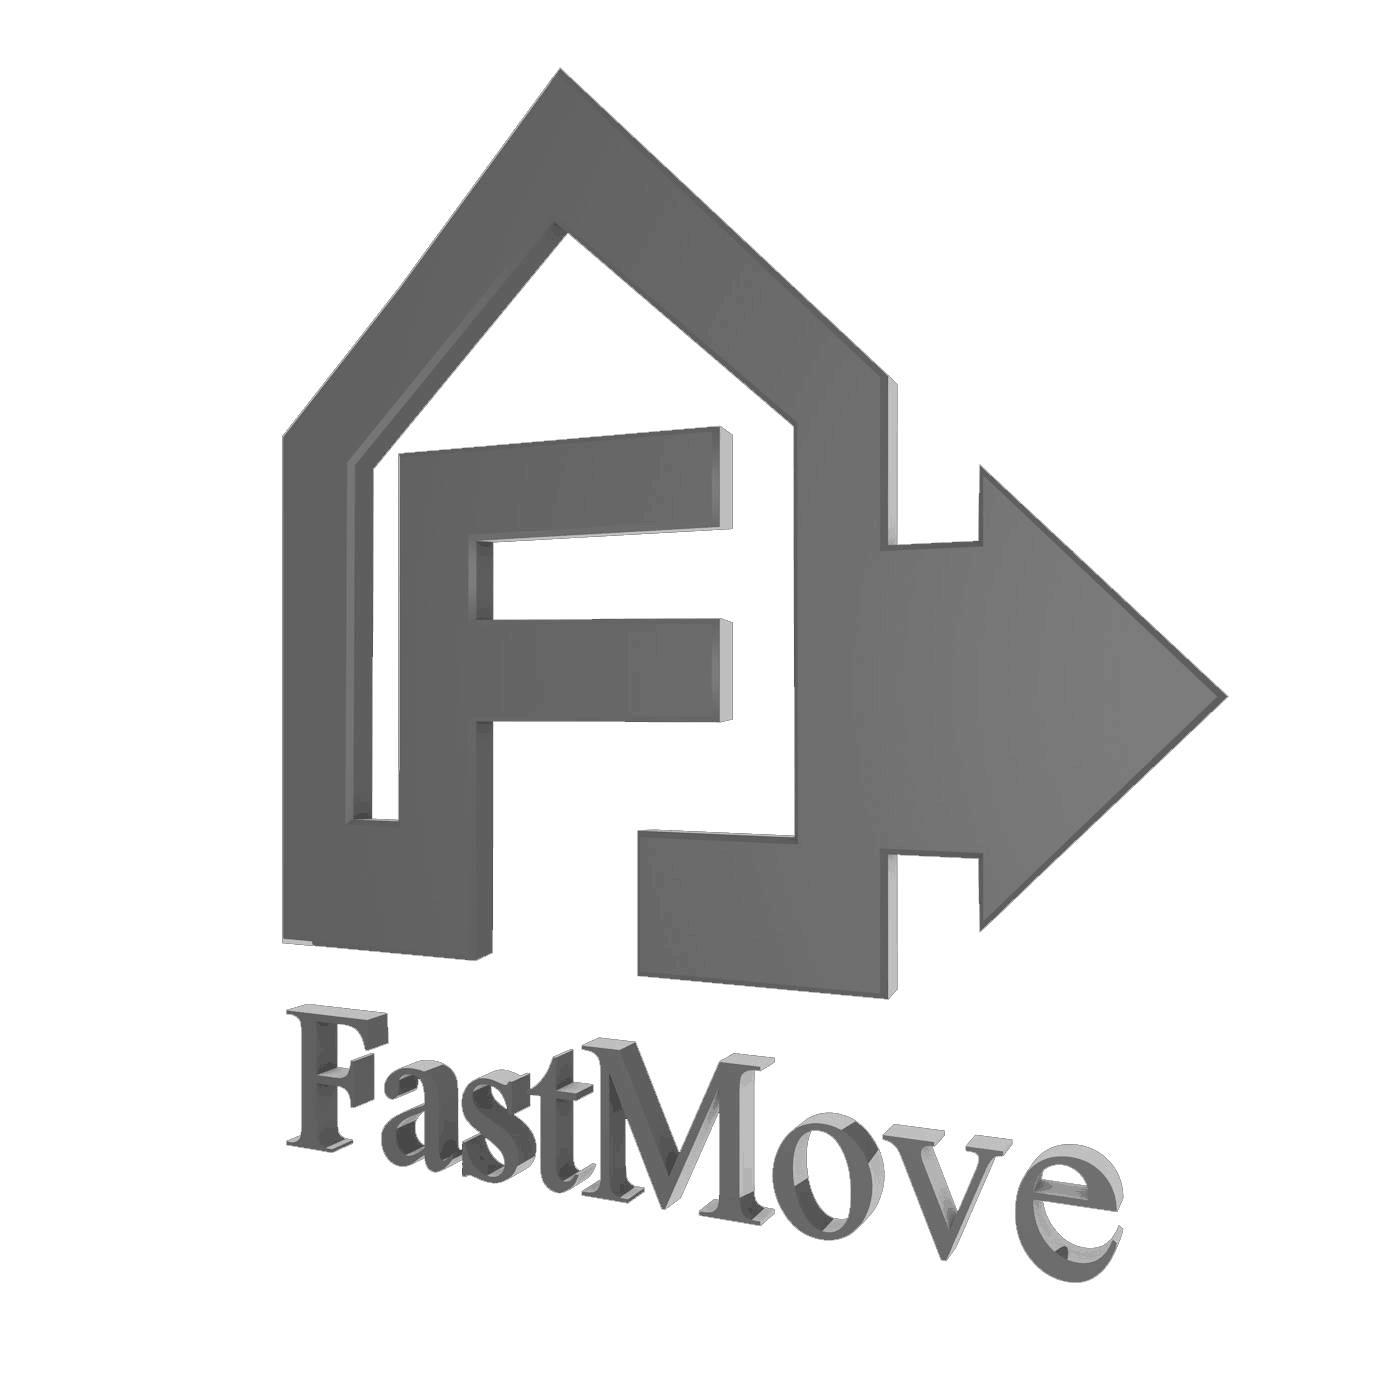 FastMove logo